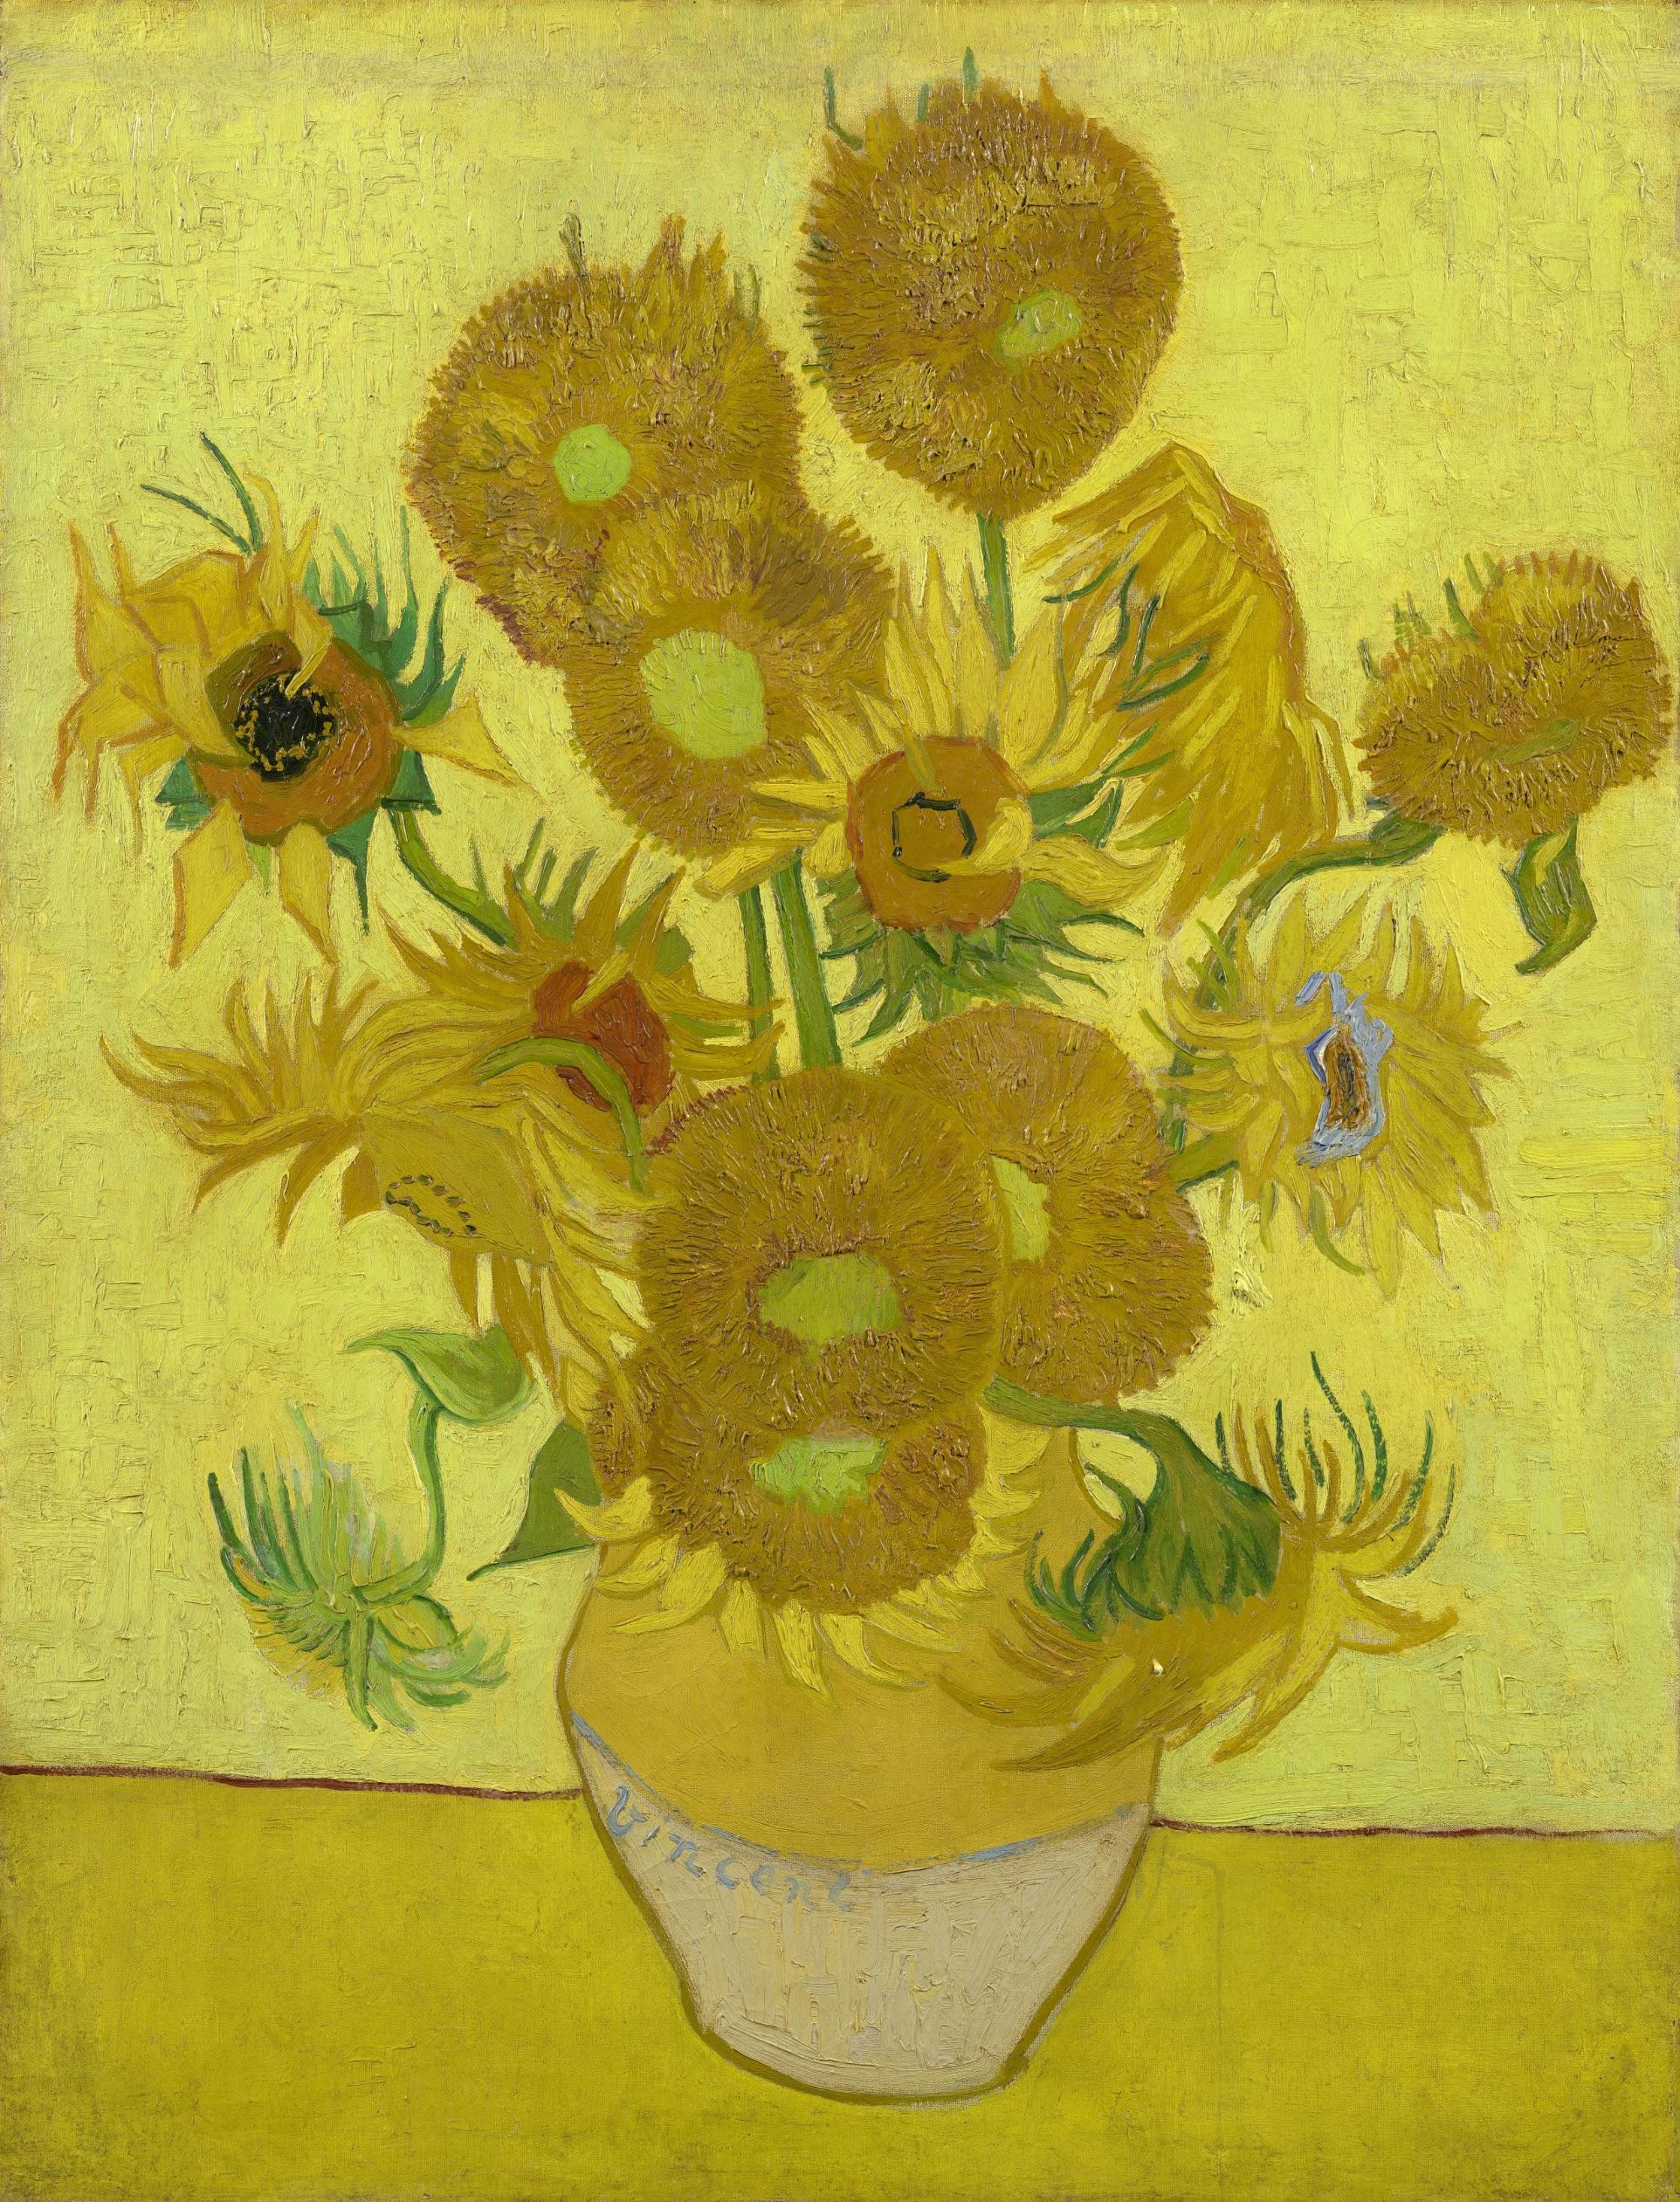 Sunflowers (1889), Vincent Van Gogh, Van Gogh Museum, Amsterdam, Hollanda